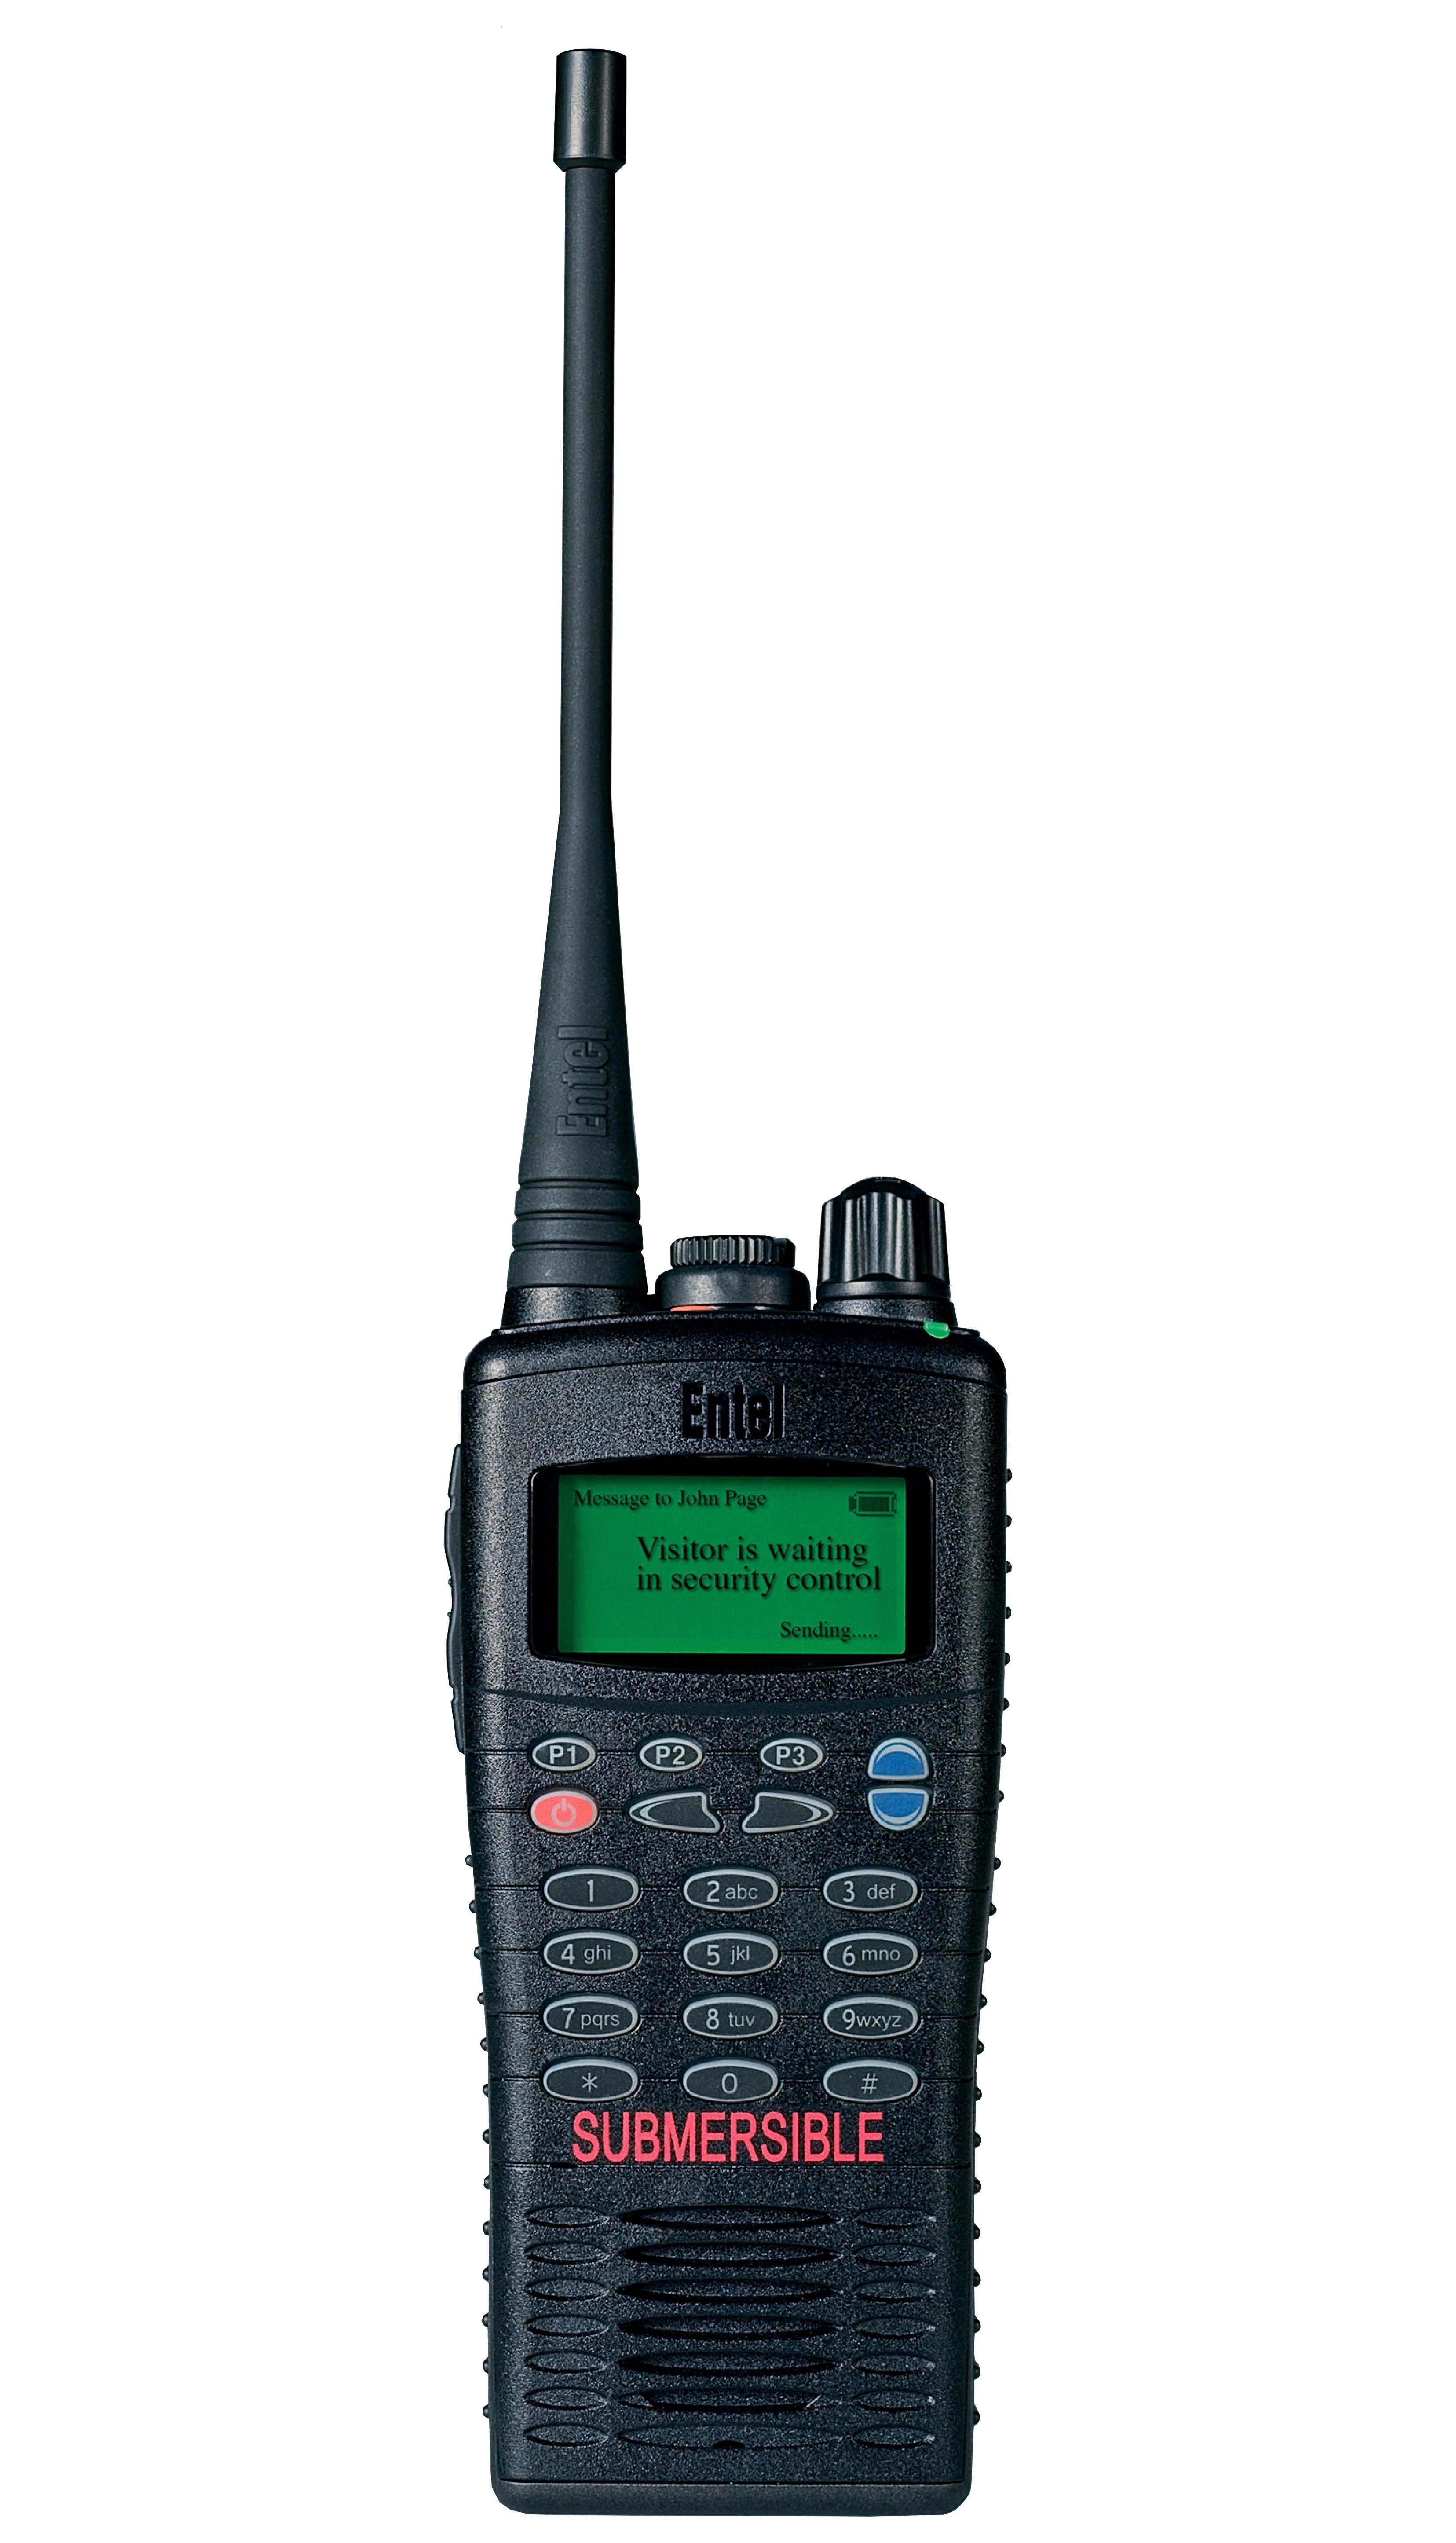 Entel HT926 Two Way Radio - VHF High